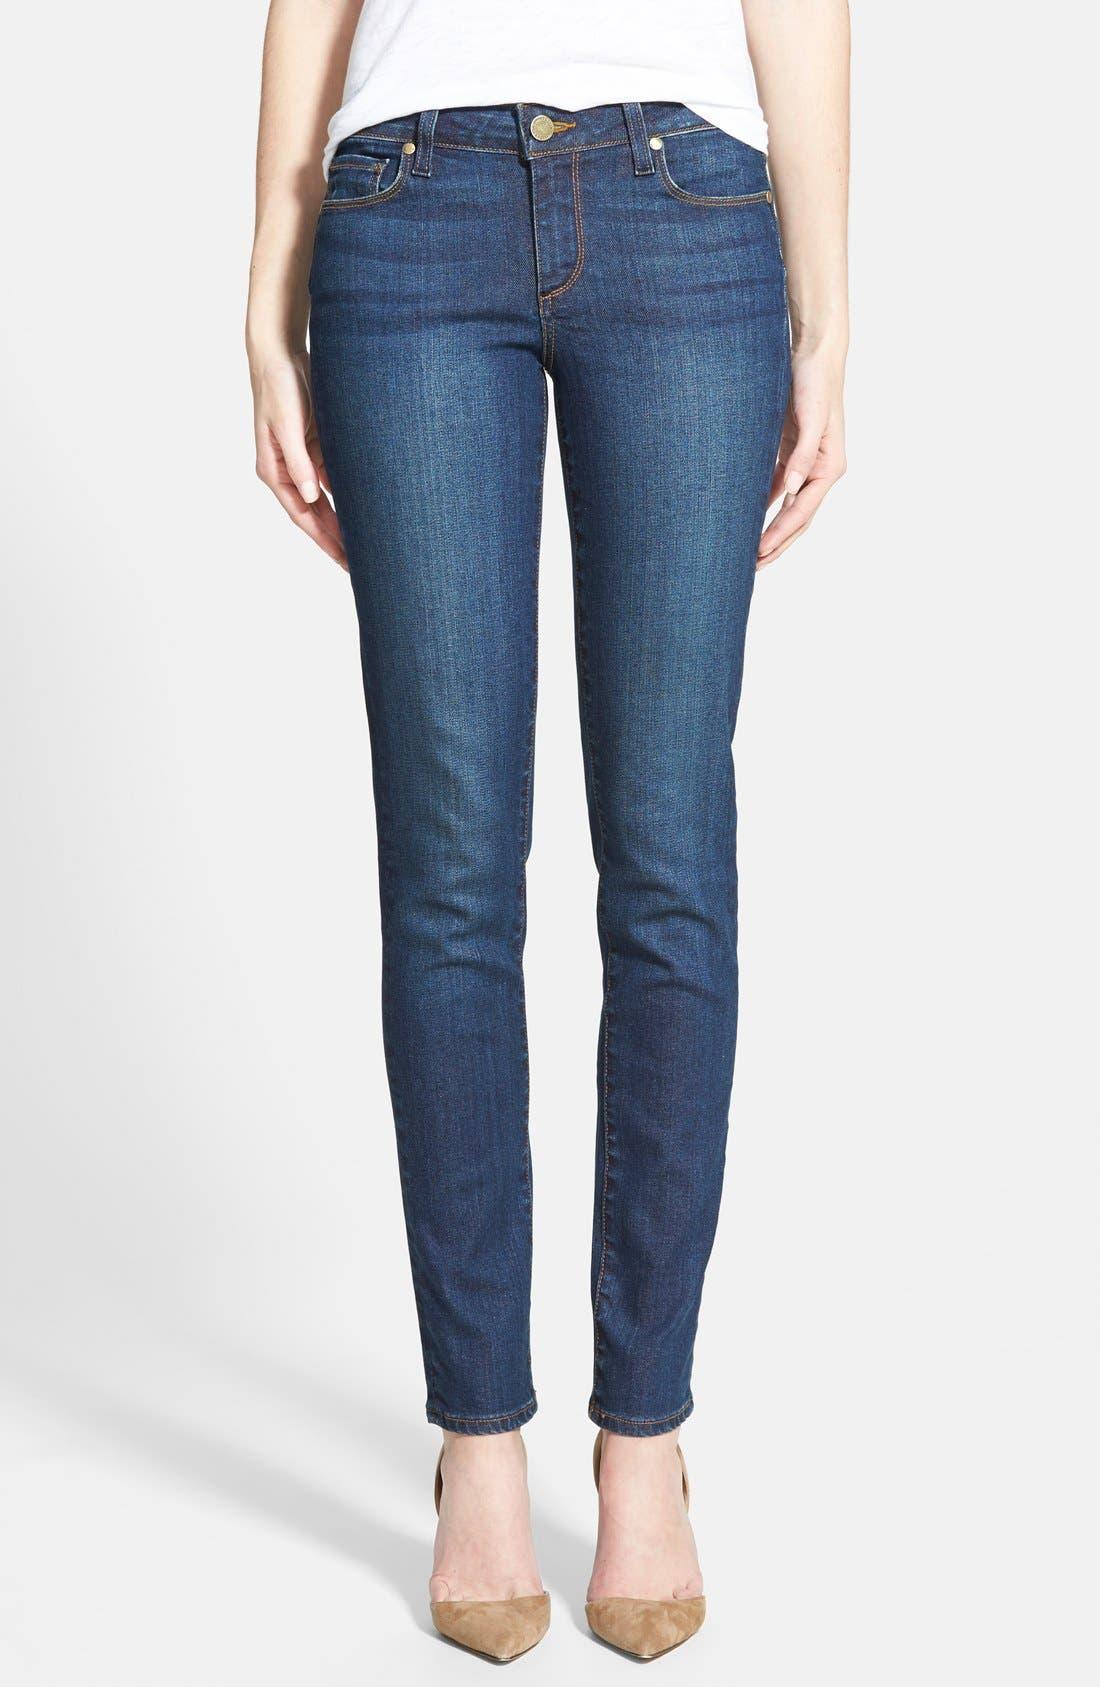 Alternate Image 1 Selected - Paige Denim 'Skyline' Skinny Jeans (Mischa Blue)